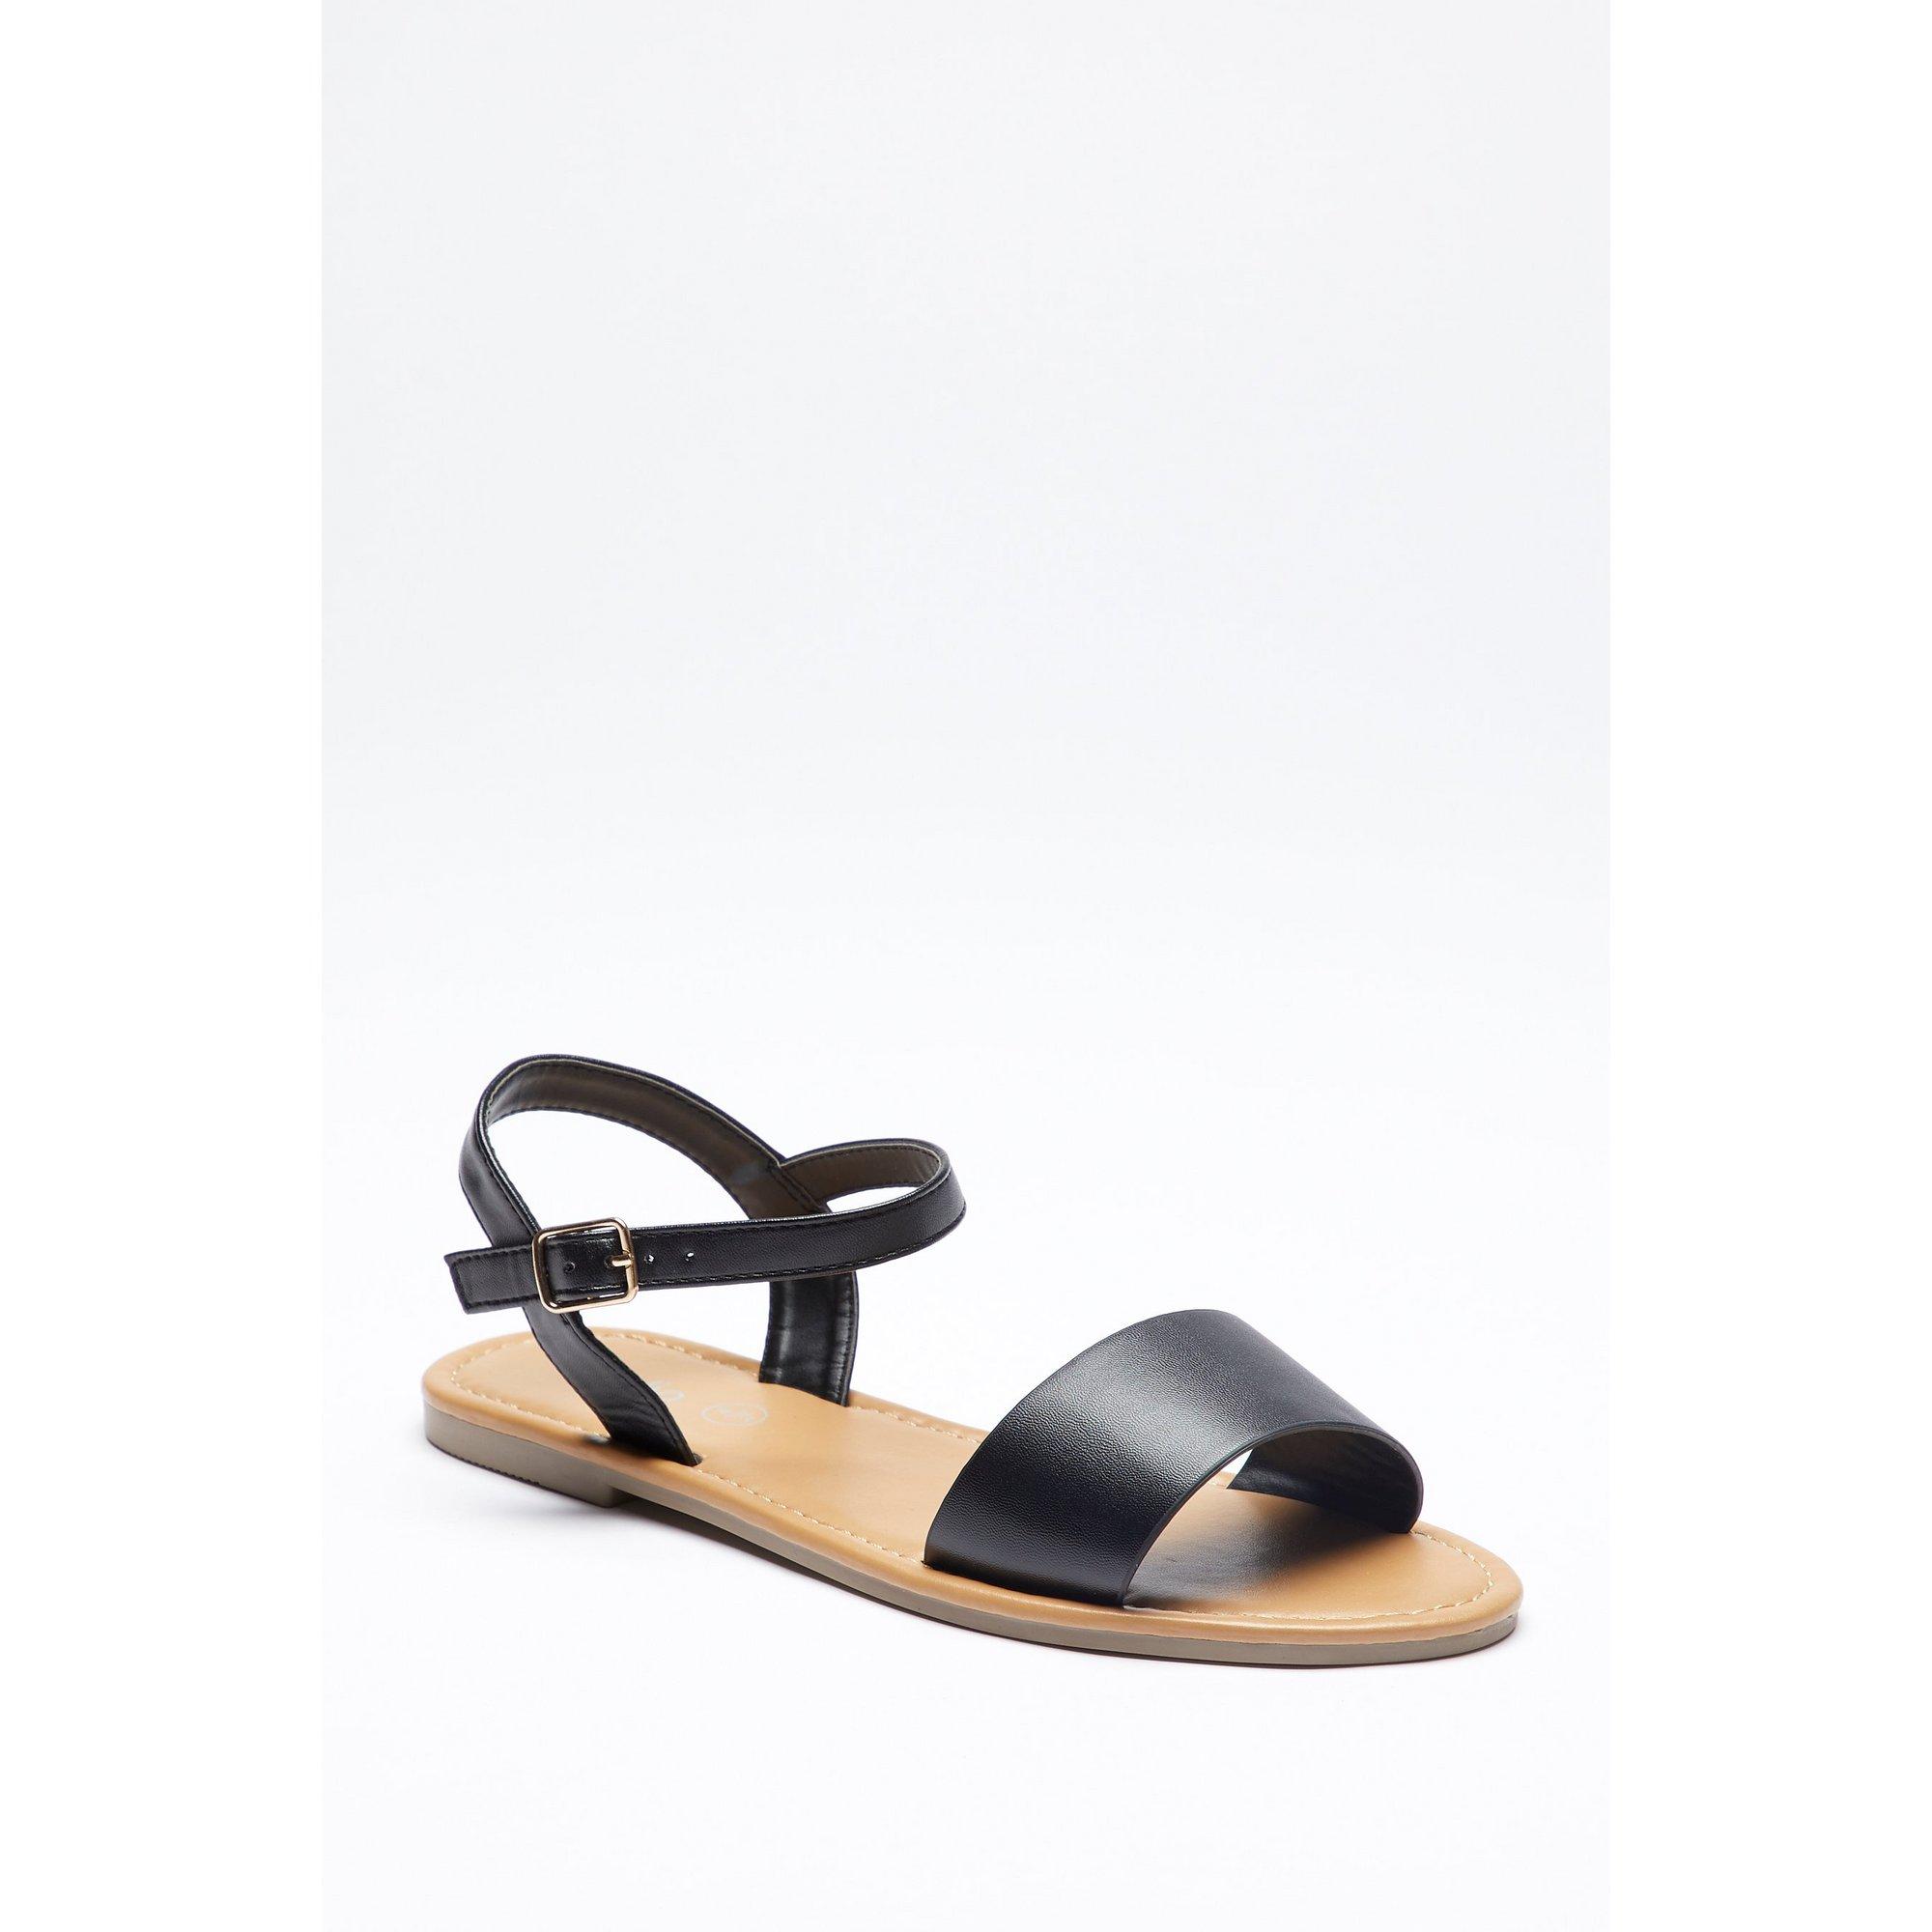 Image of 2 Part Sandals